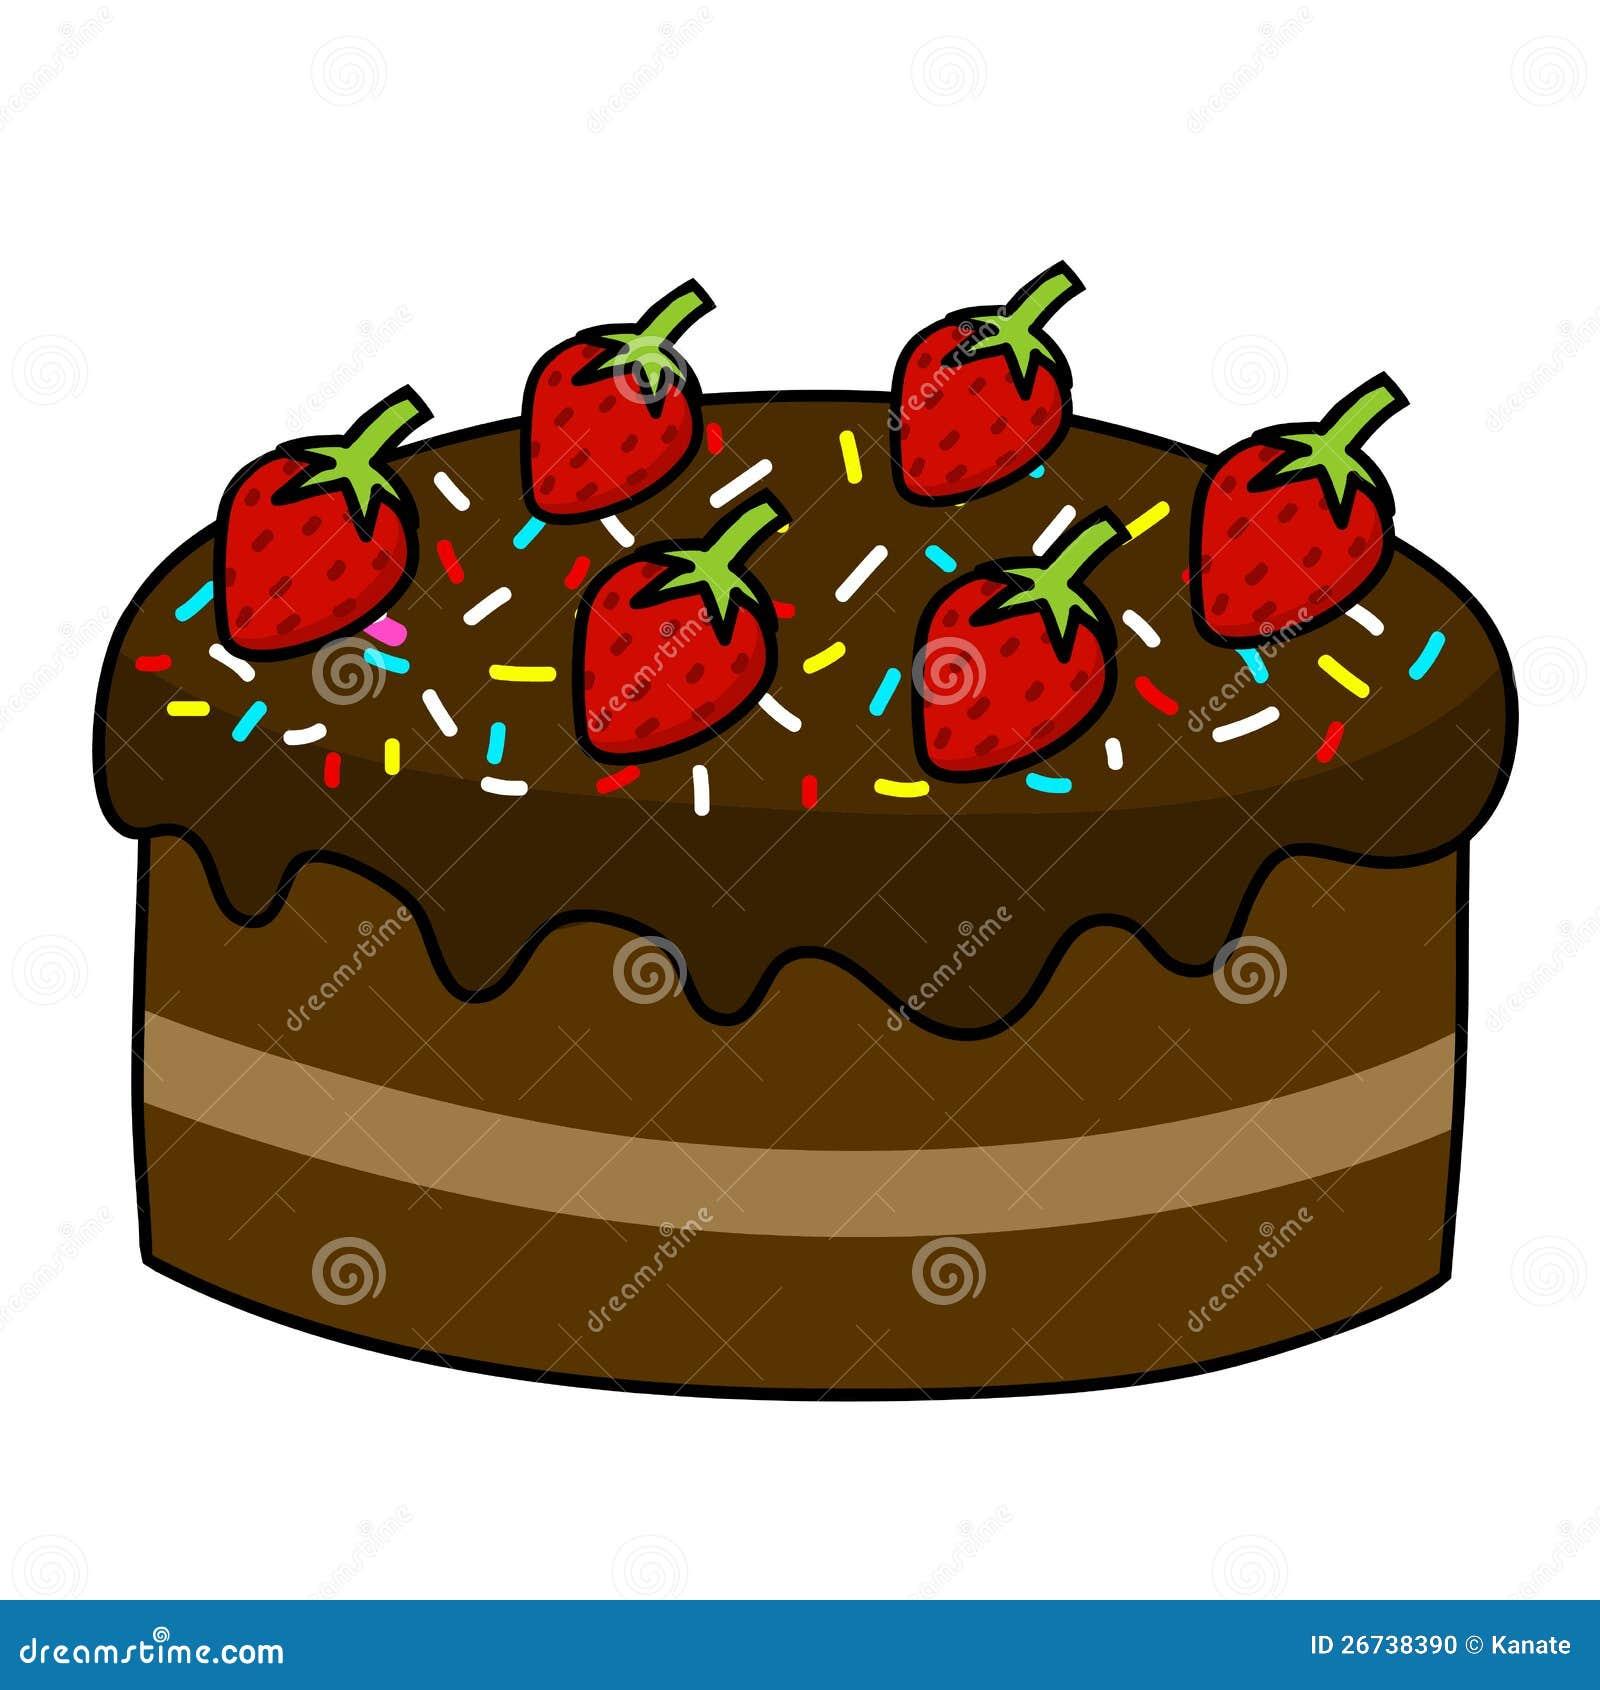 cartoon cake hand drawing 26738390 cute doll birthday cake 5 on cute doll birthday cake